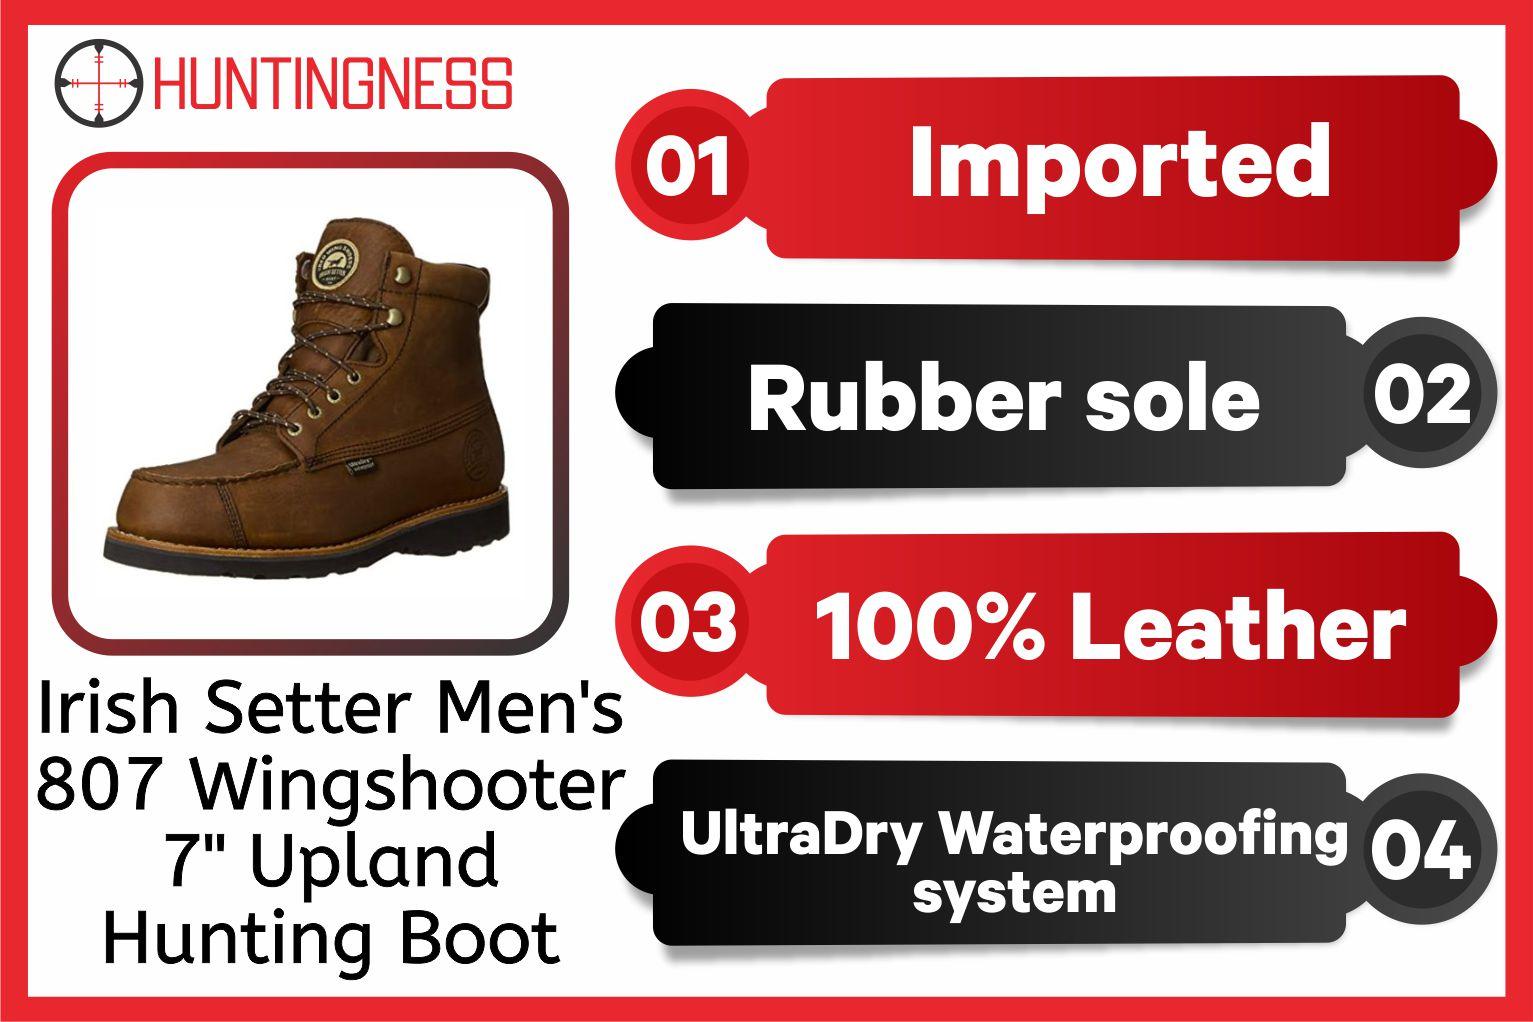 "Irish Setter Men's 807 Wingshooter 7"" Upland Hunting Boot infographics"